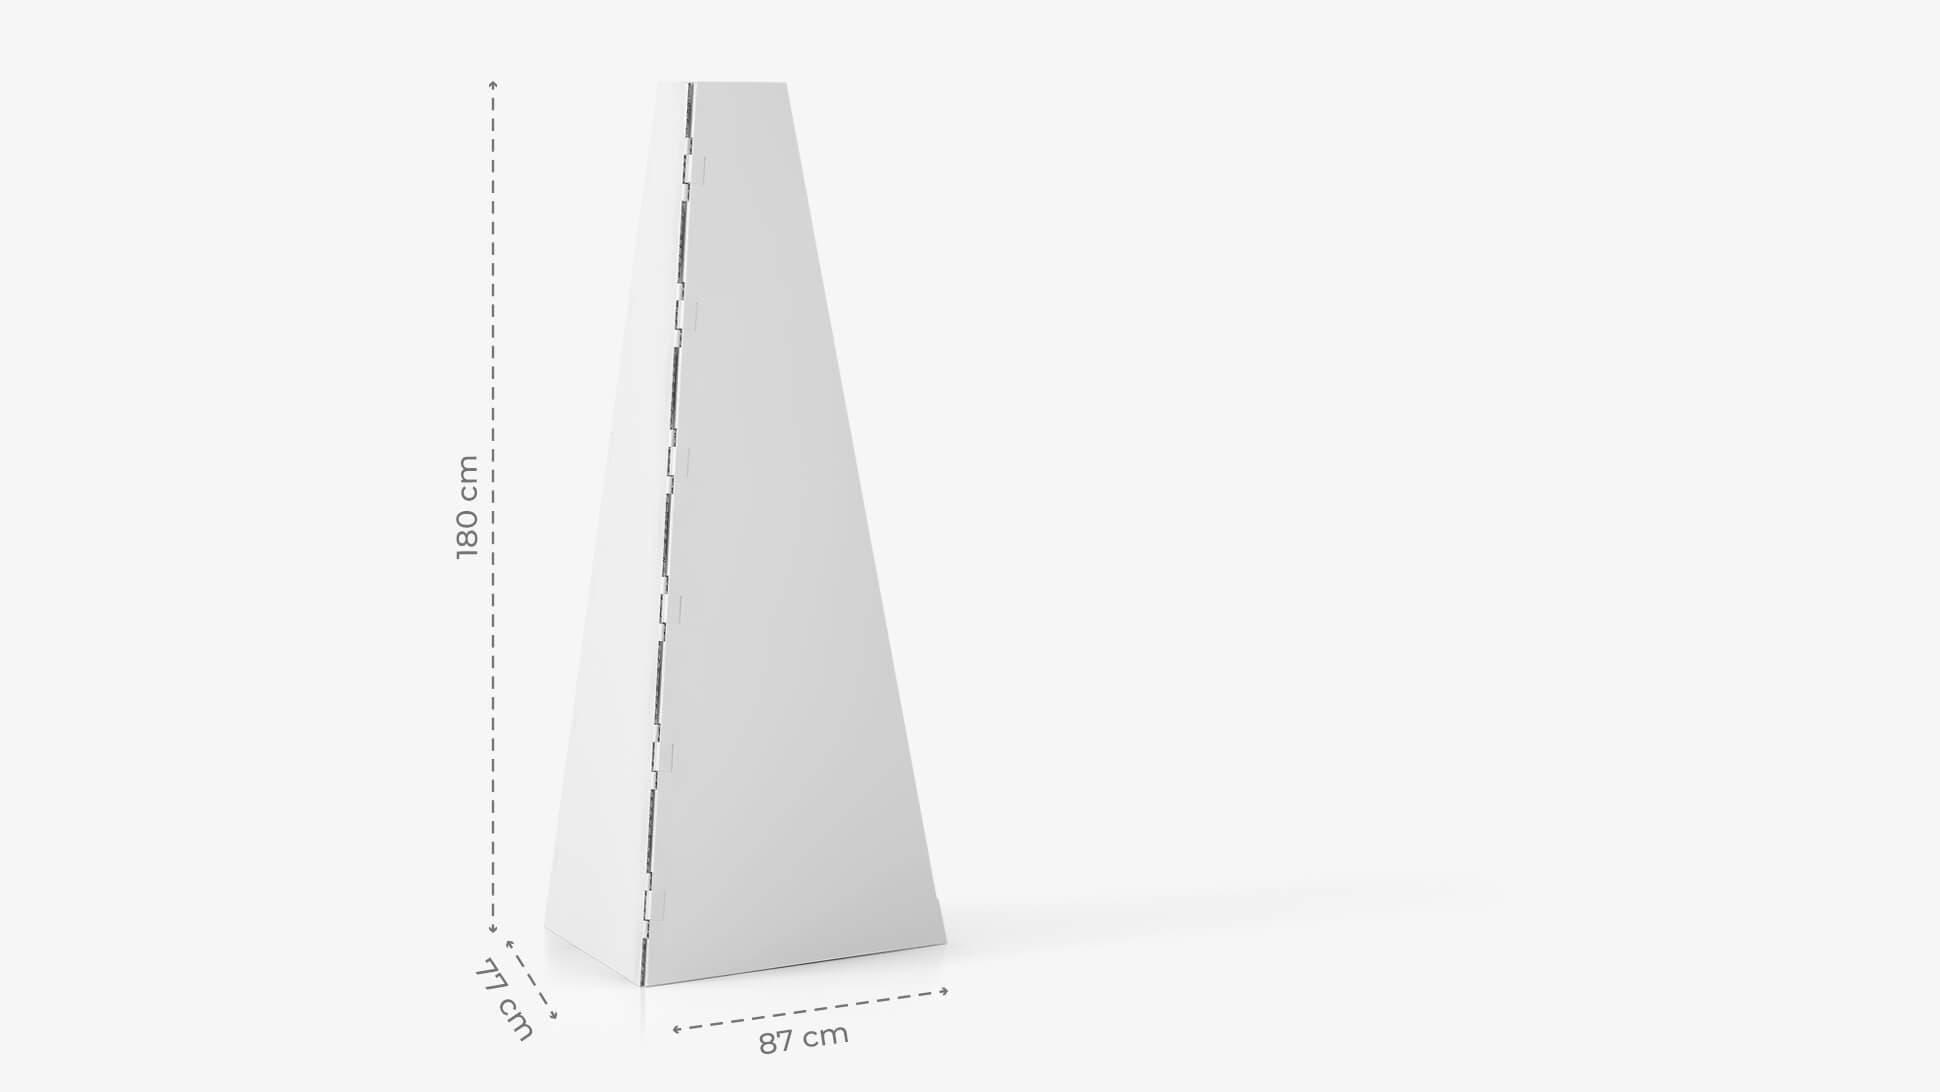 Display piramidale personalizzabile h180 cm | tictac.it